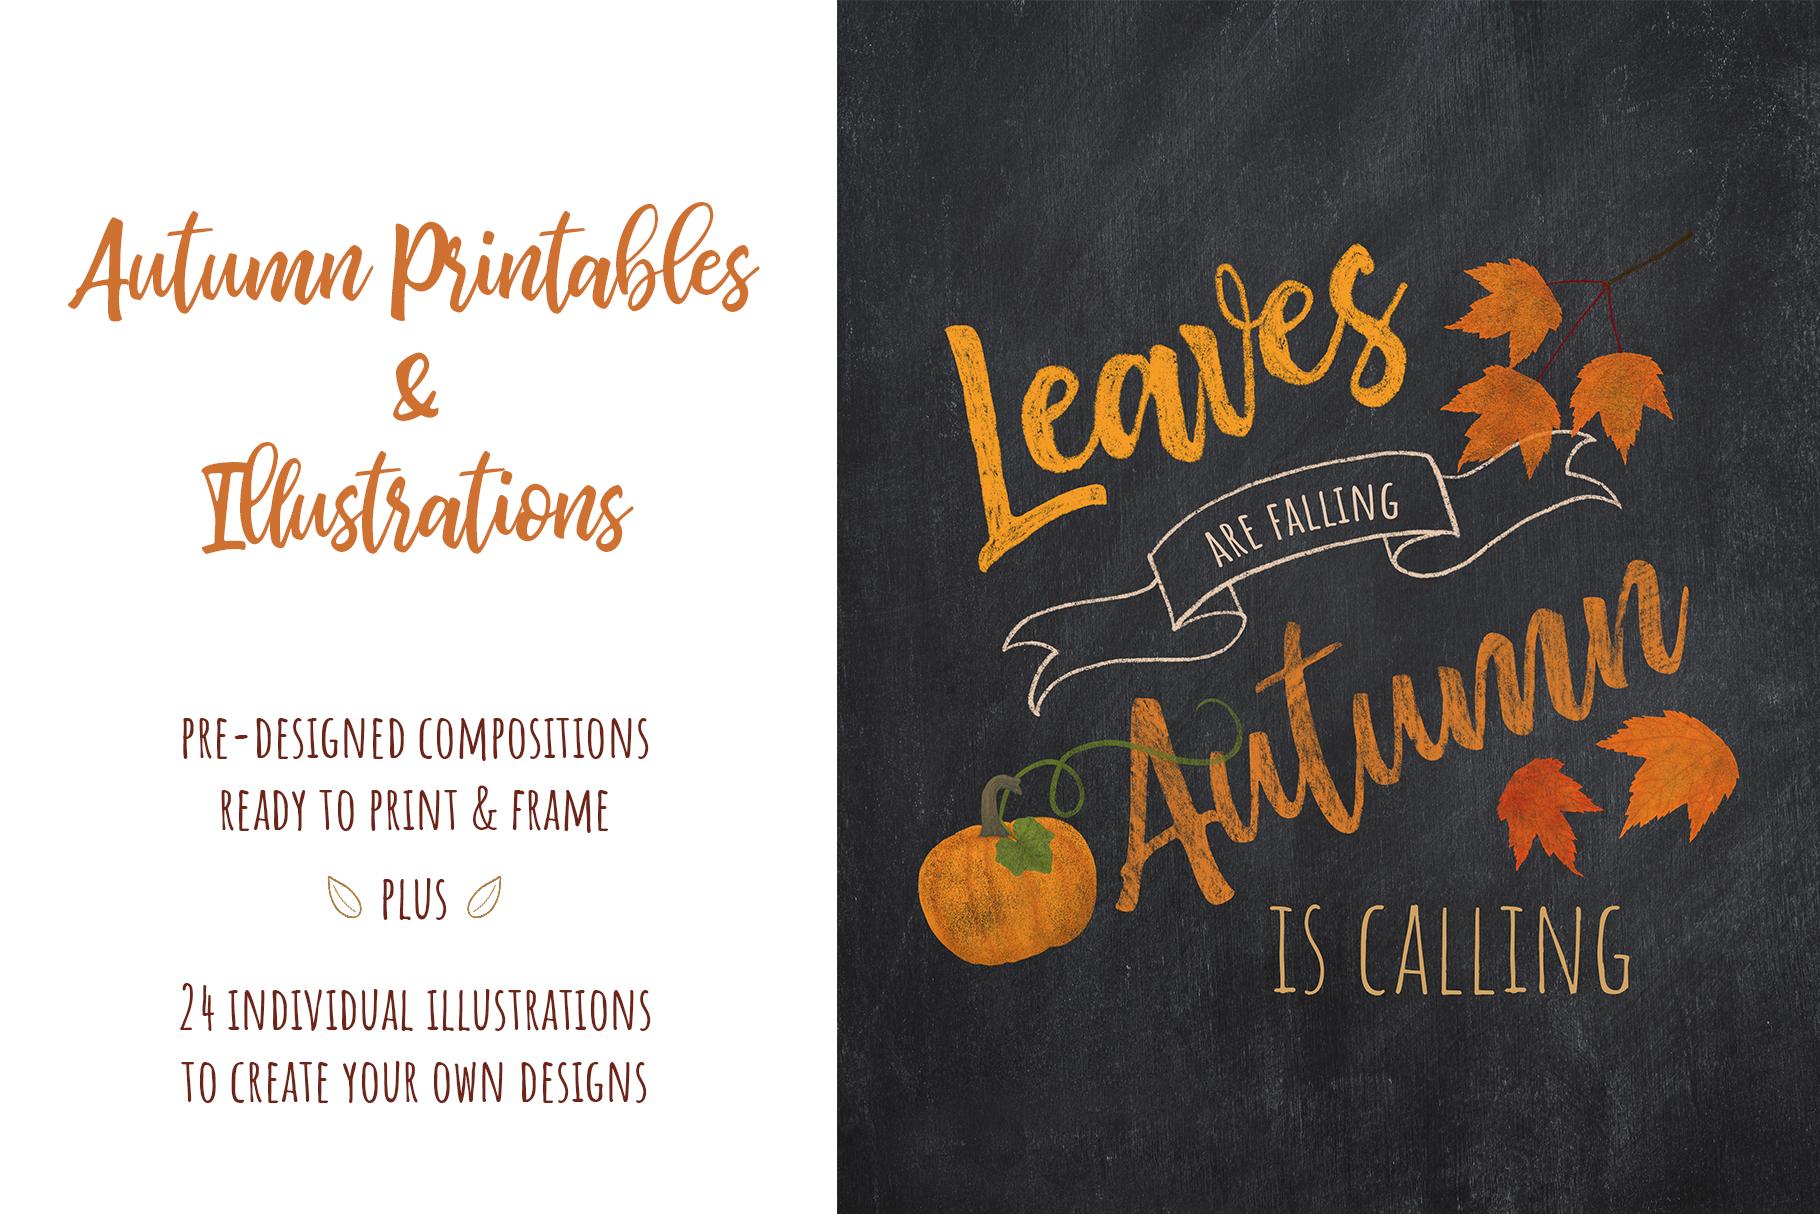 Autumn Printables & Illustrations example image 1